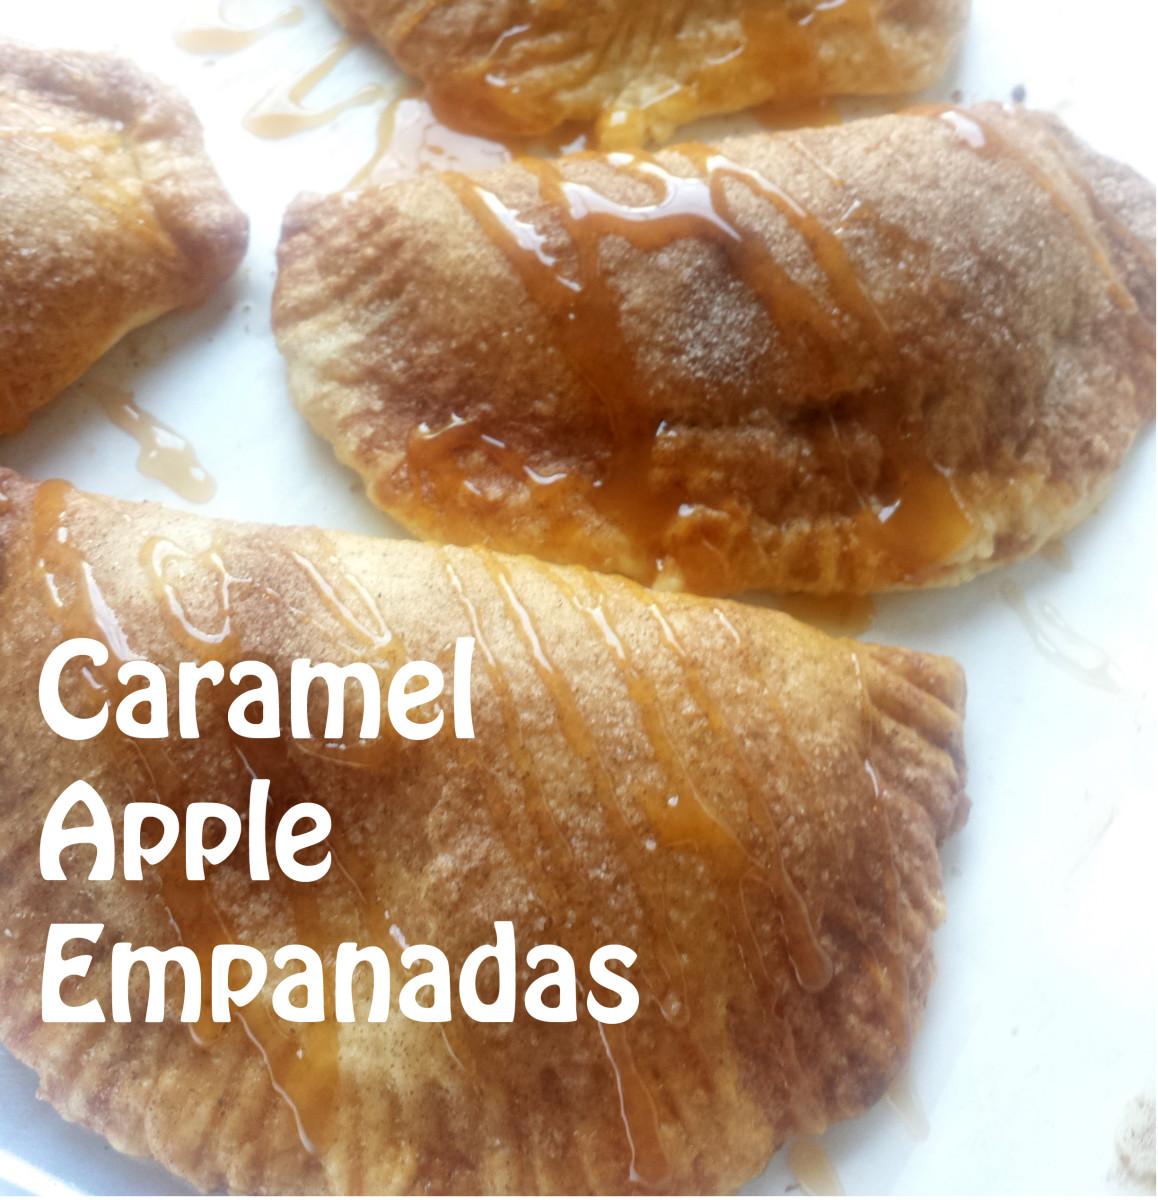 Caramel Apple Empanadas Recipe